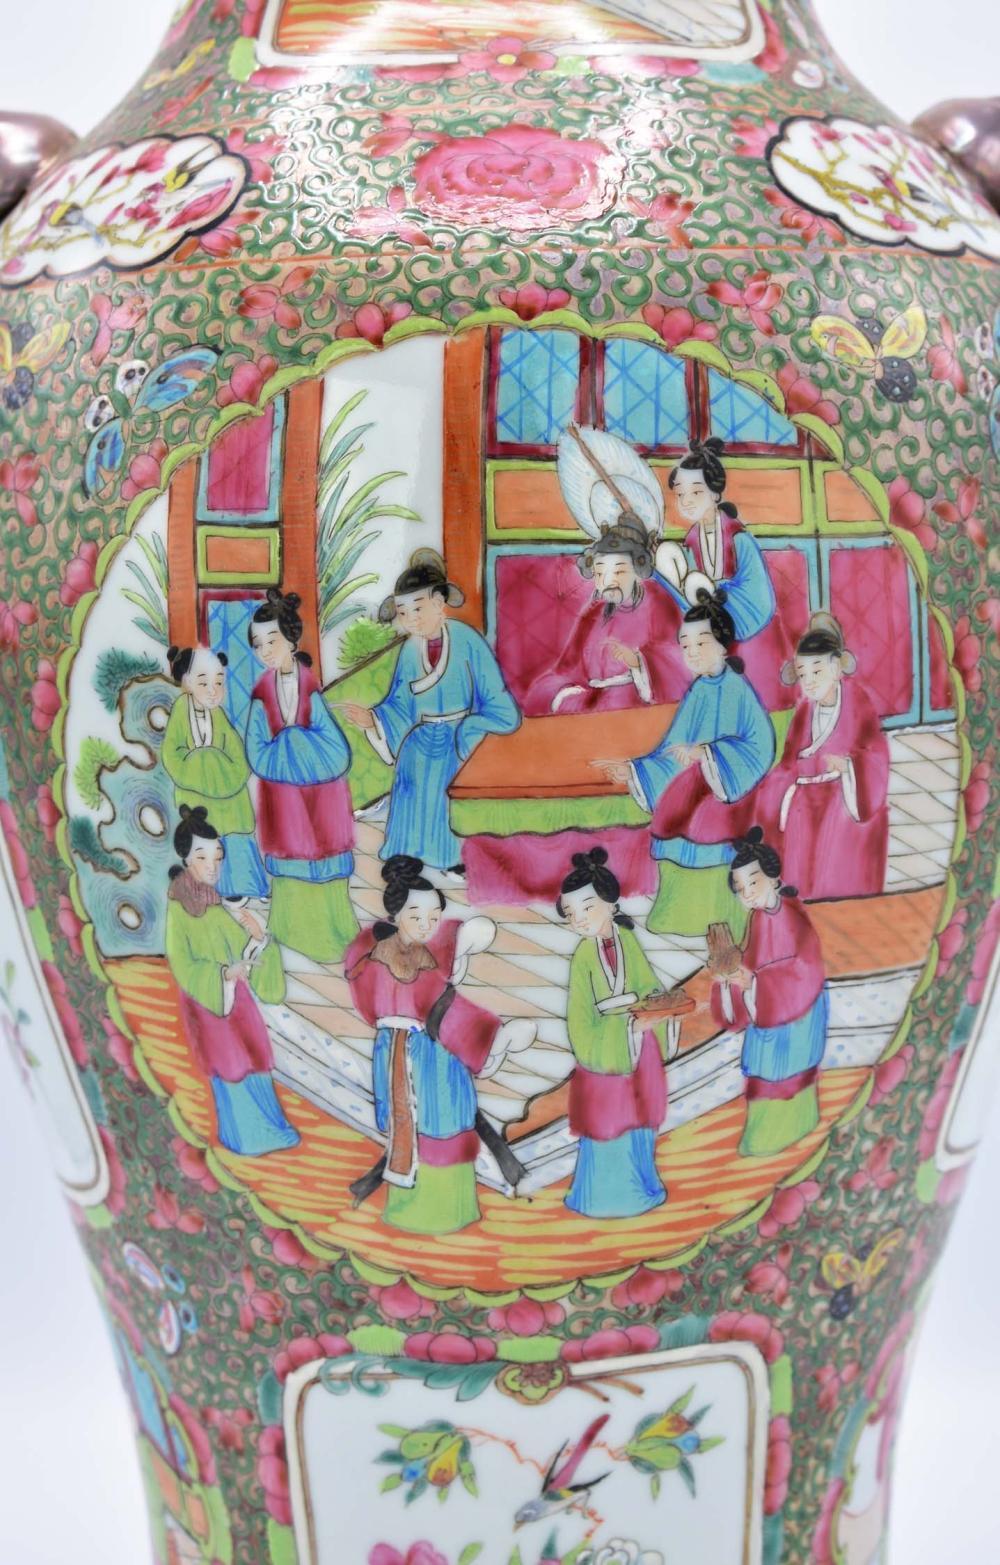 Lot 48: CHINESE EXPORT ROSE MEDALLION PORCELAIN VASE